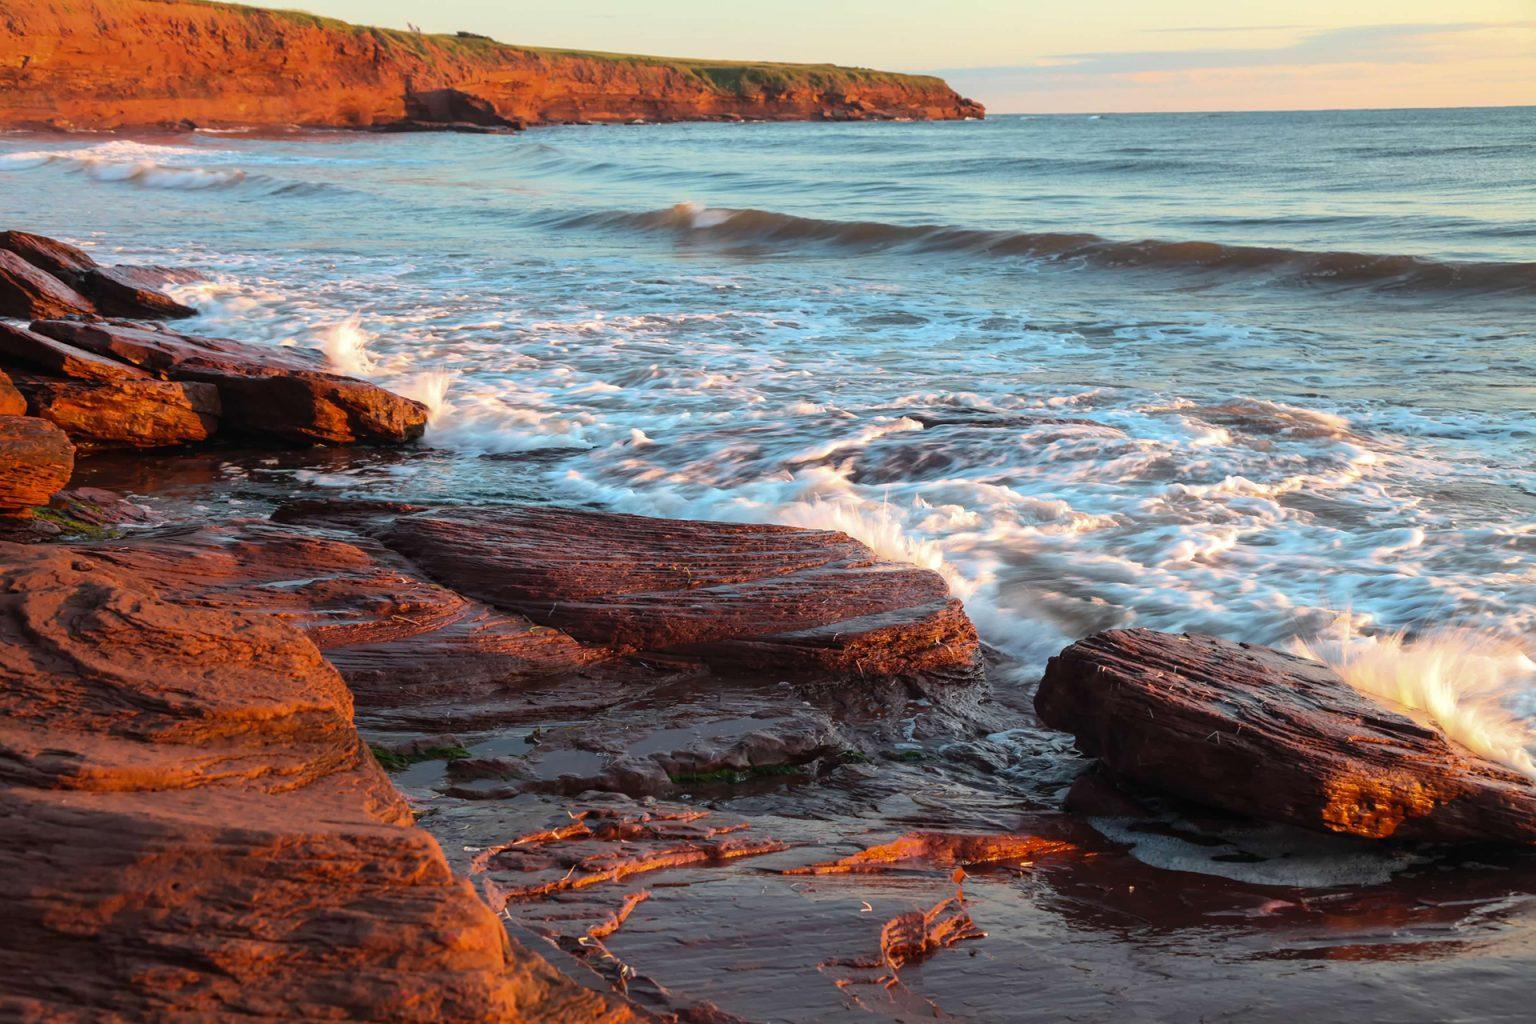 PEI Cliffs